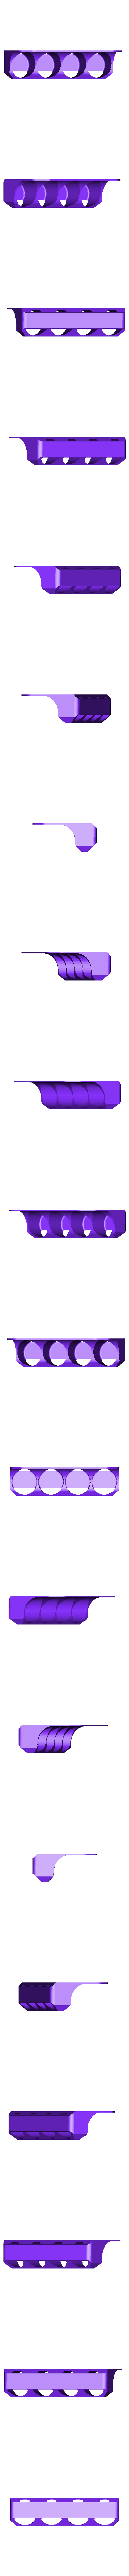 spice_rack_v2.stl Download free STL file Spice Rack v2 • 3D printing object, 3DME